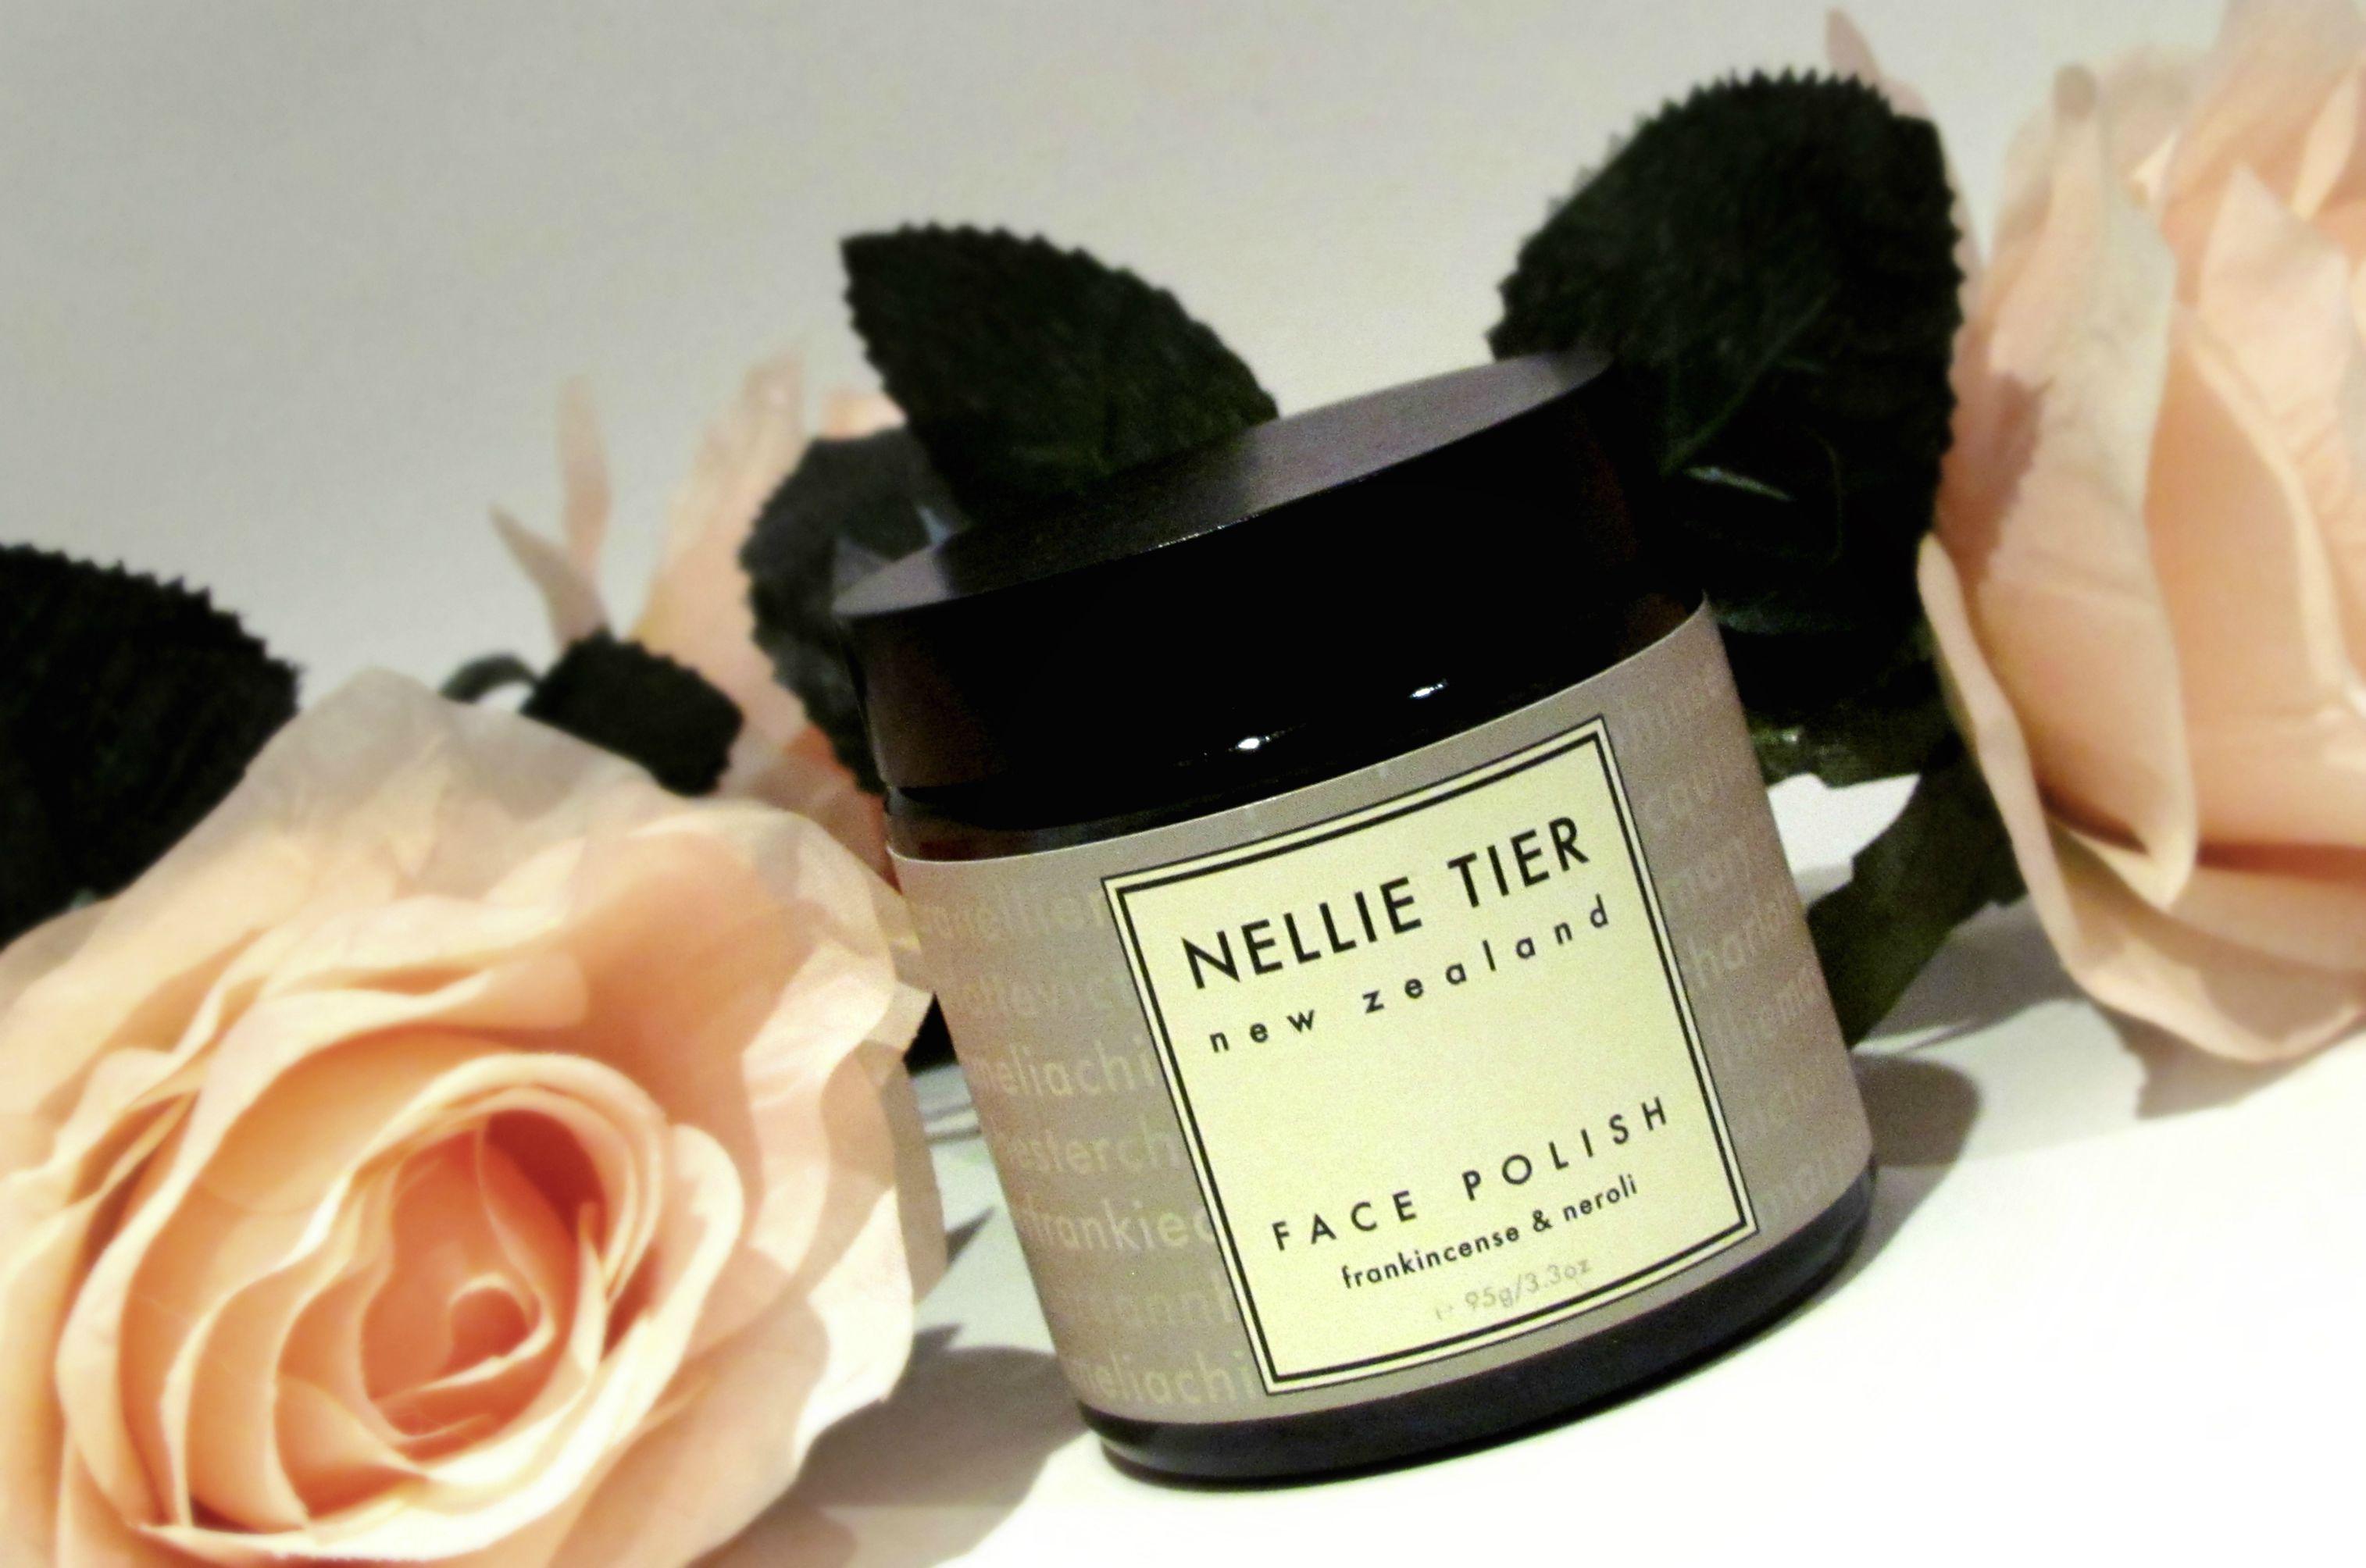 Nellie Tier Frankincense & Neroli Face Polish | Review